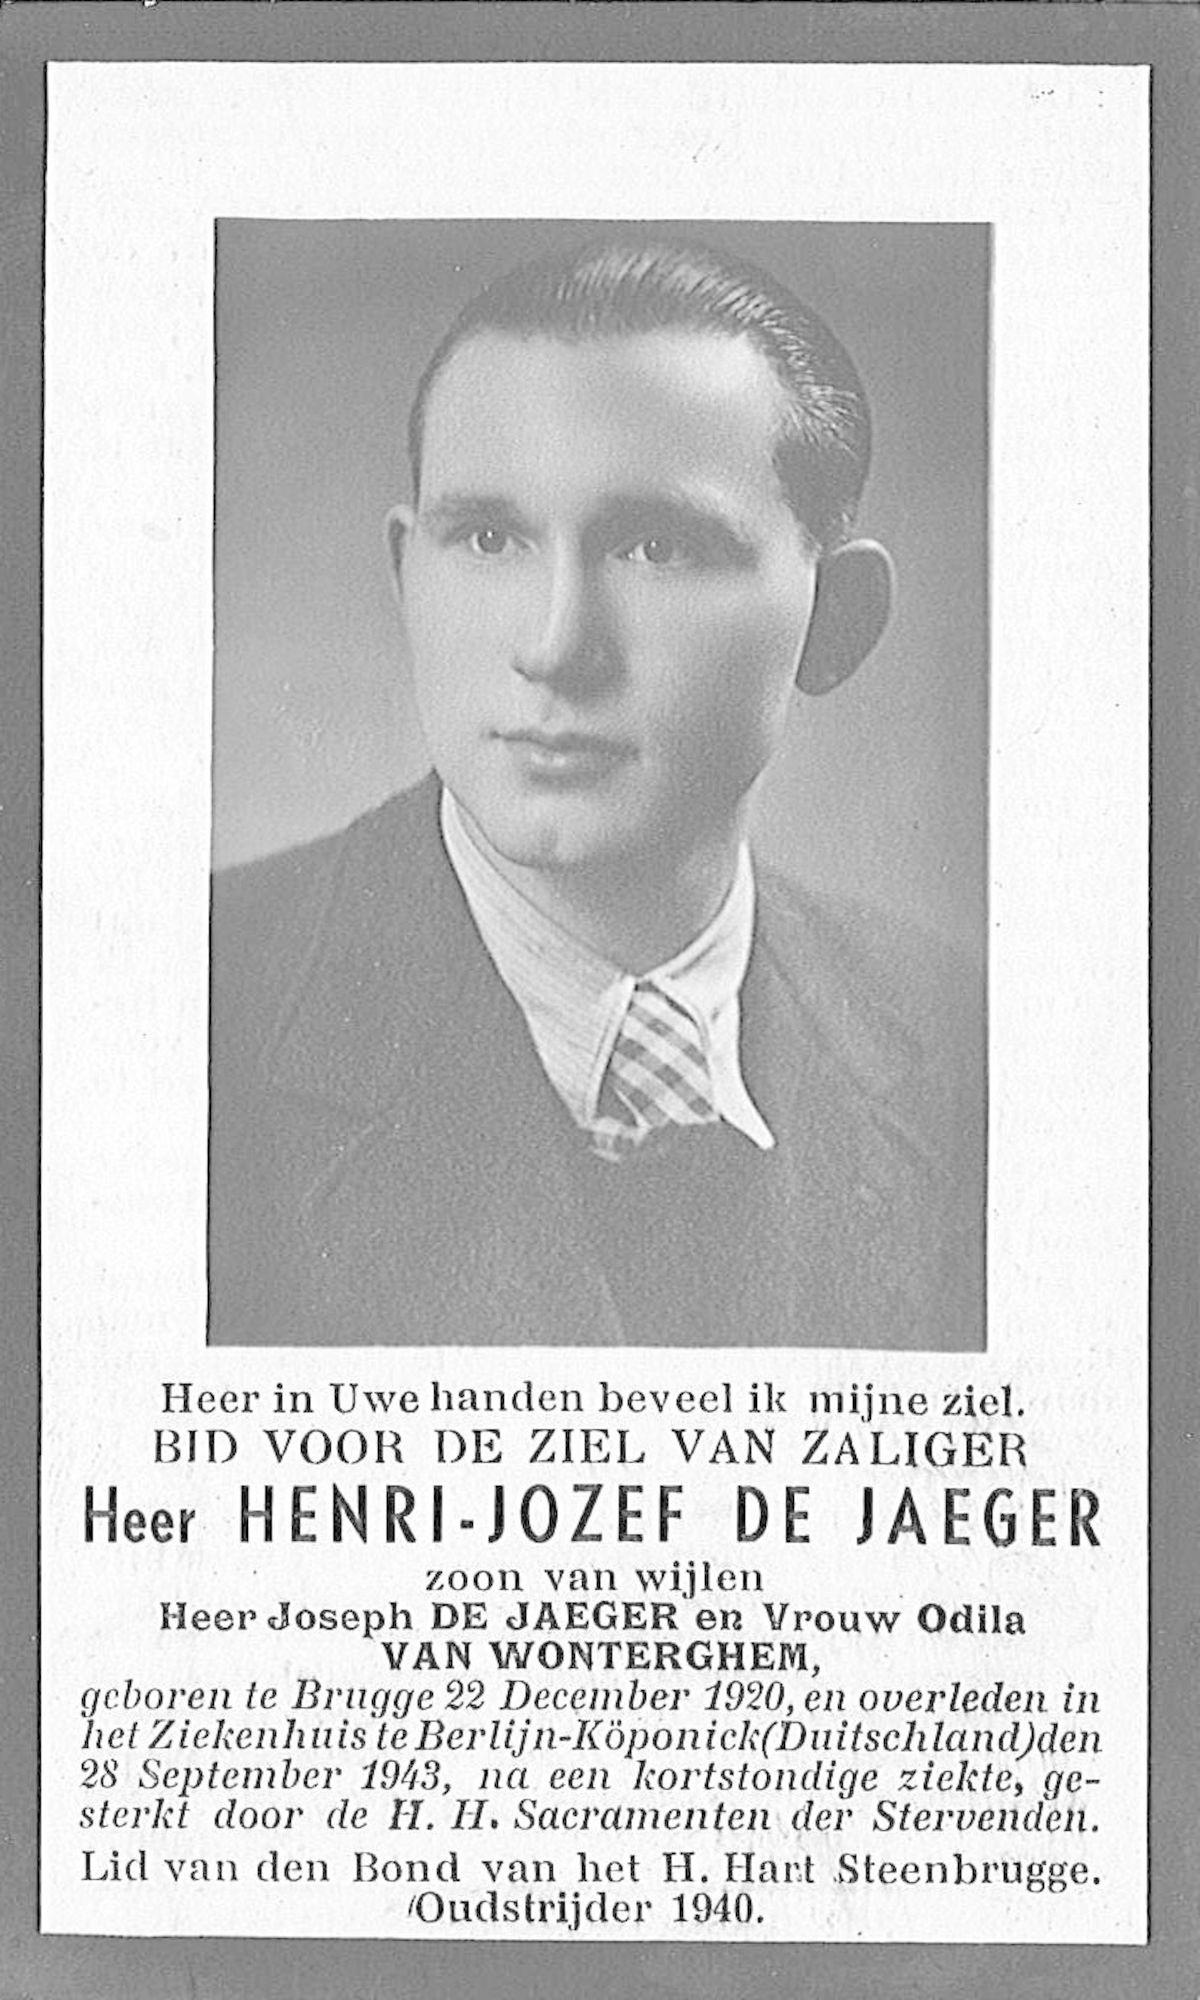 Henri-Jozef De Jaeger